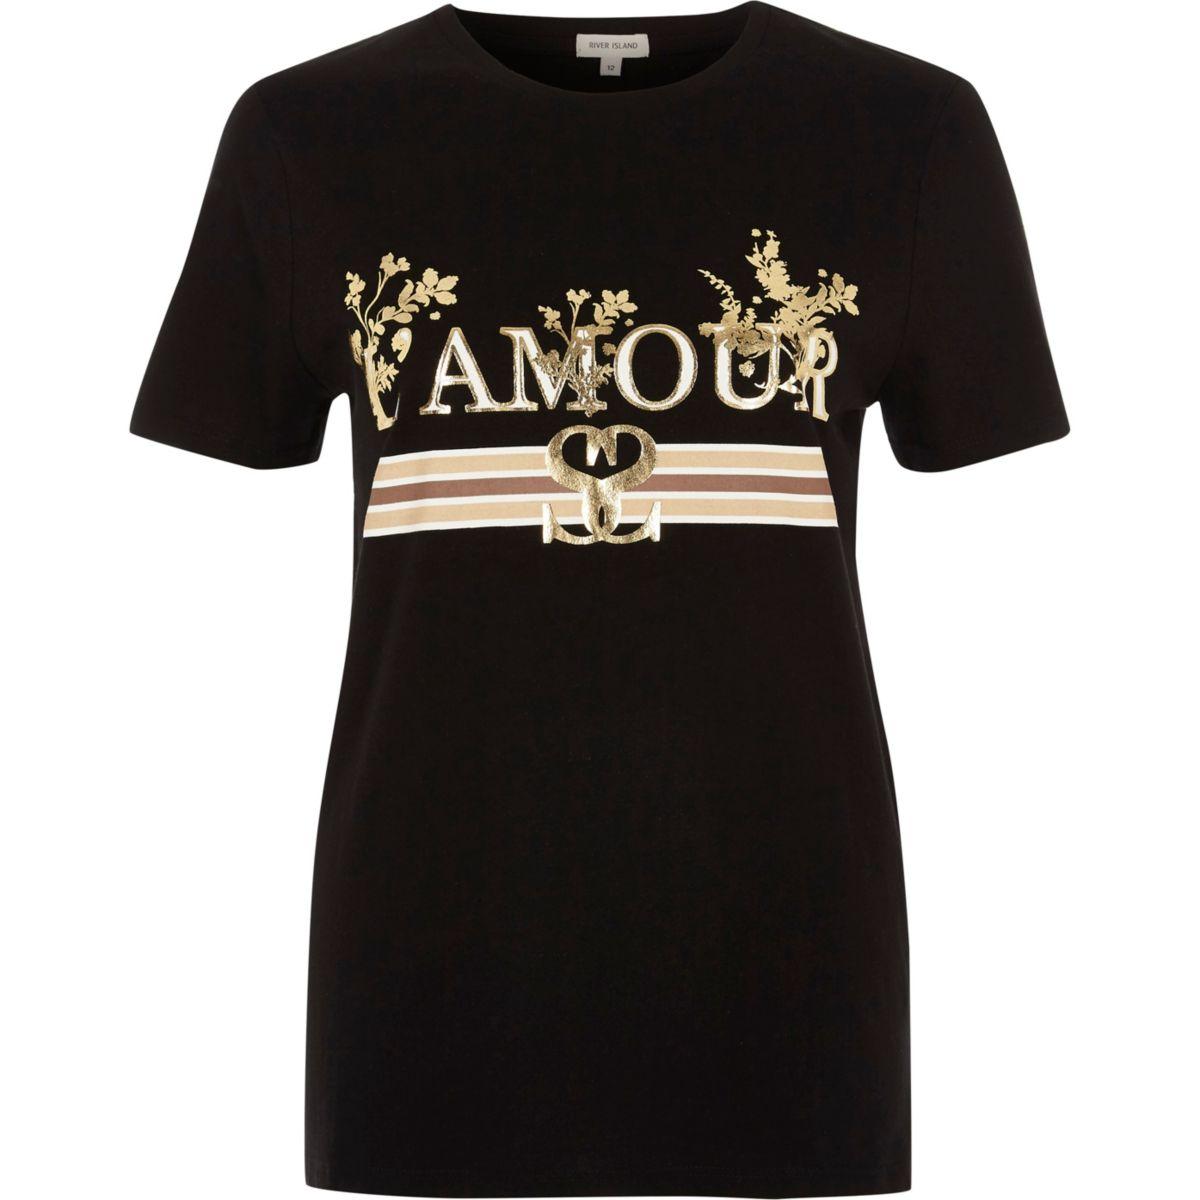 Black l amour foil metallic print t shirt print t for Foil print t shirts custom